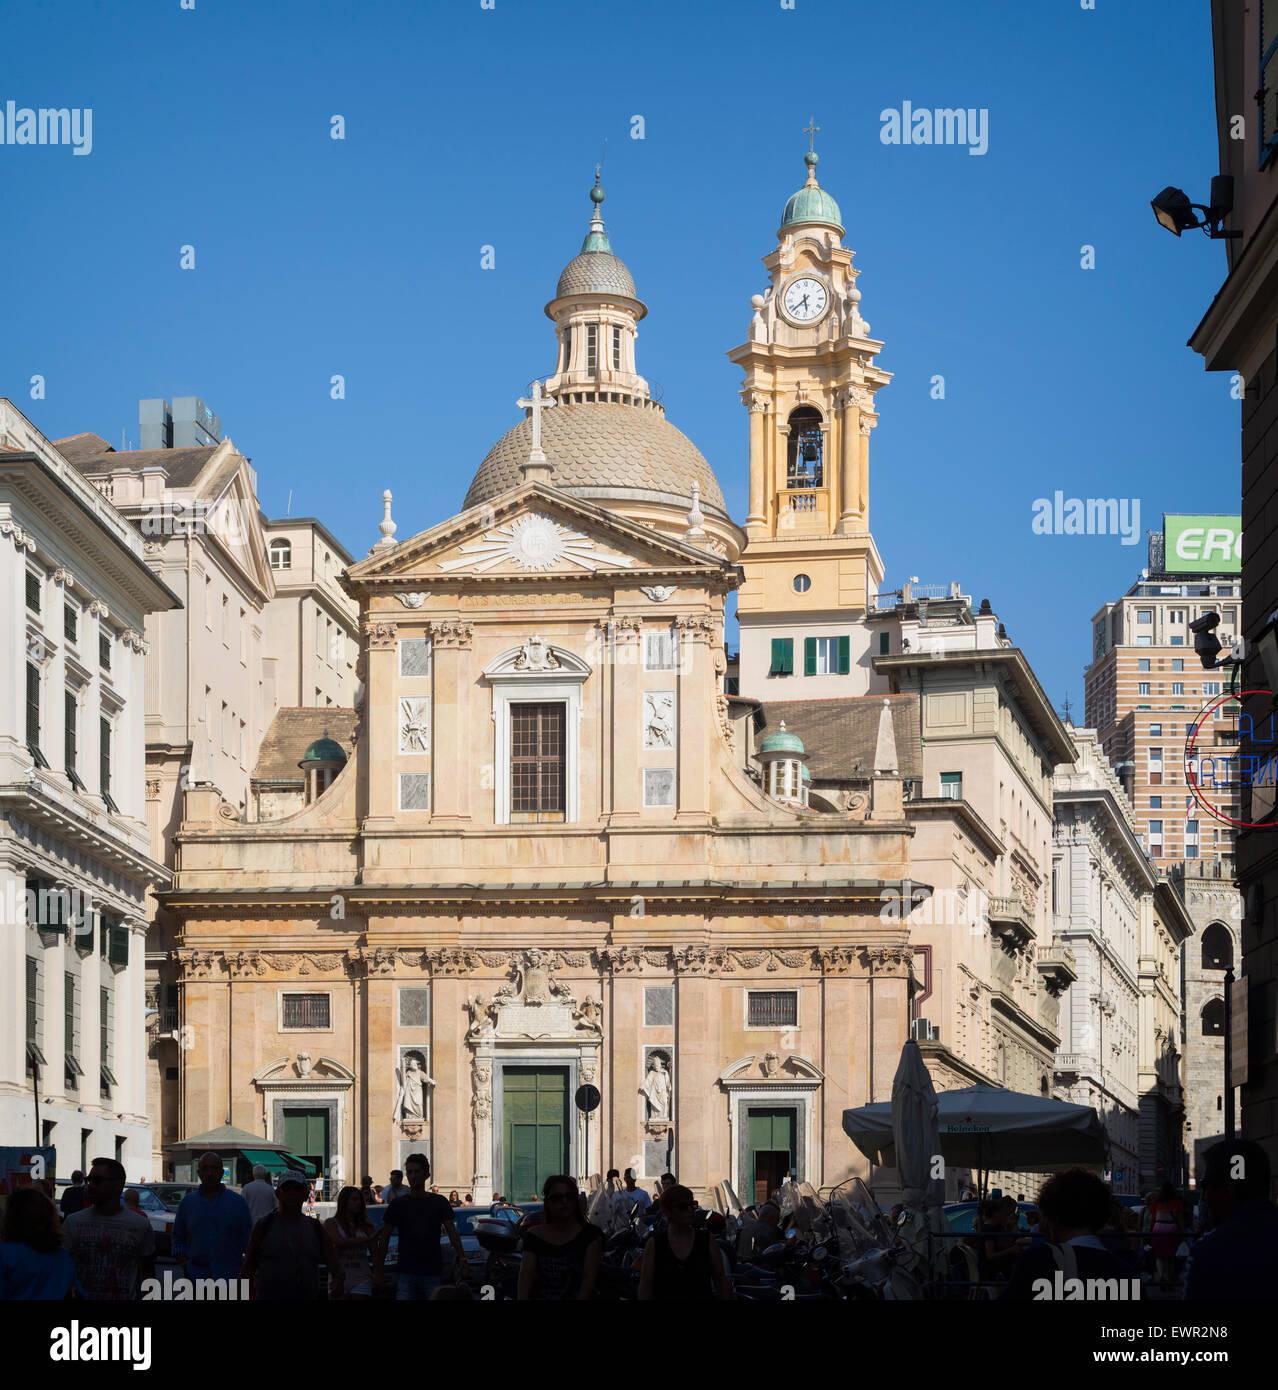 genoa, liguria, italy. baroque church of gesu or santi ambrogio e